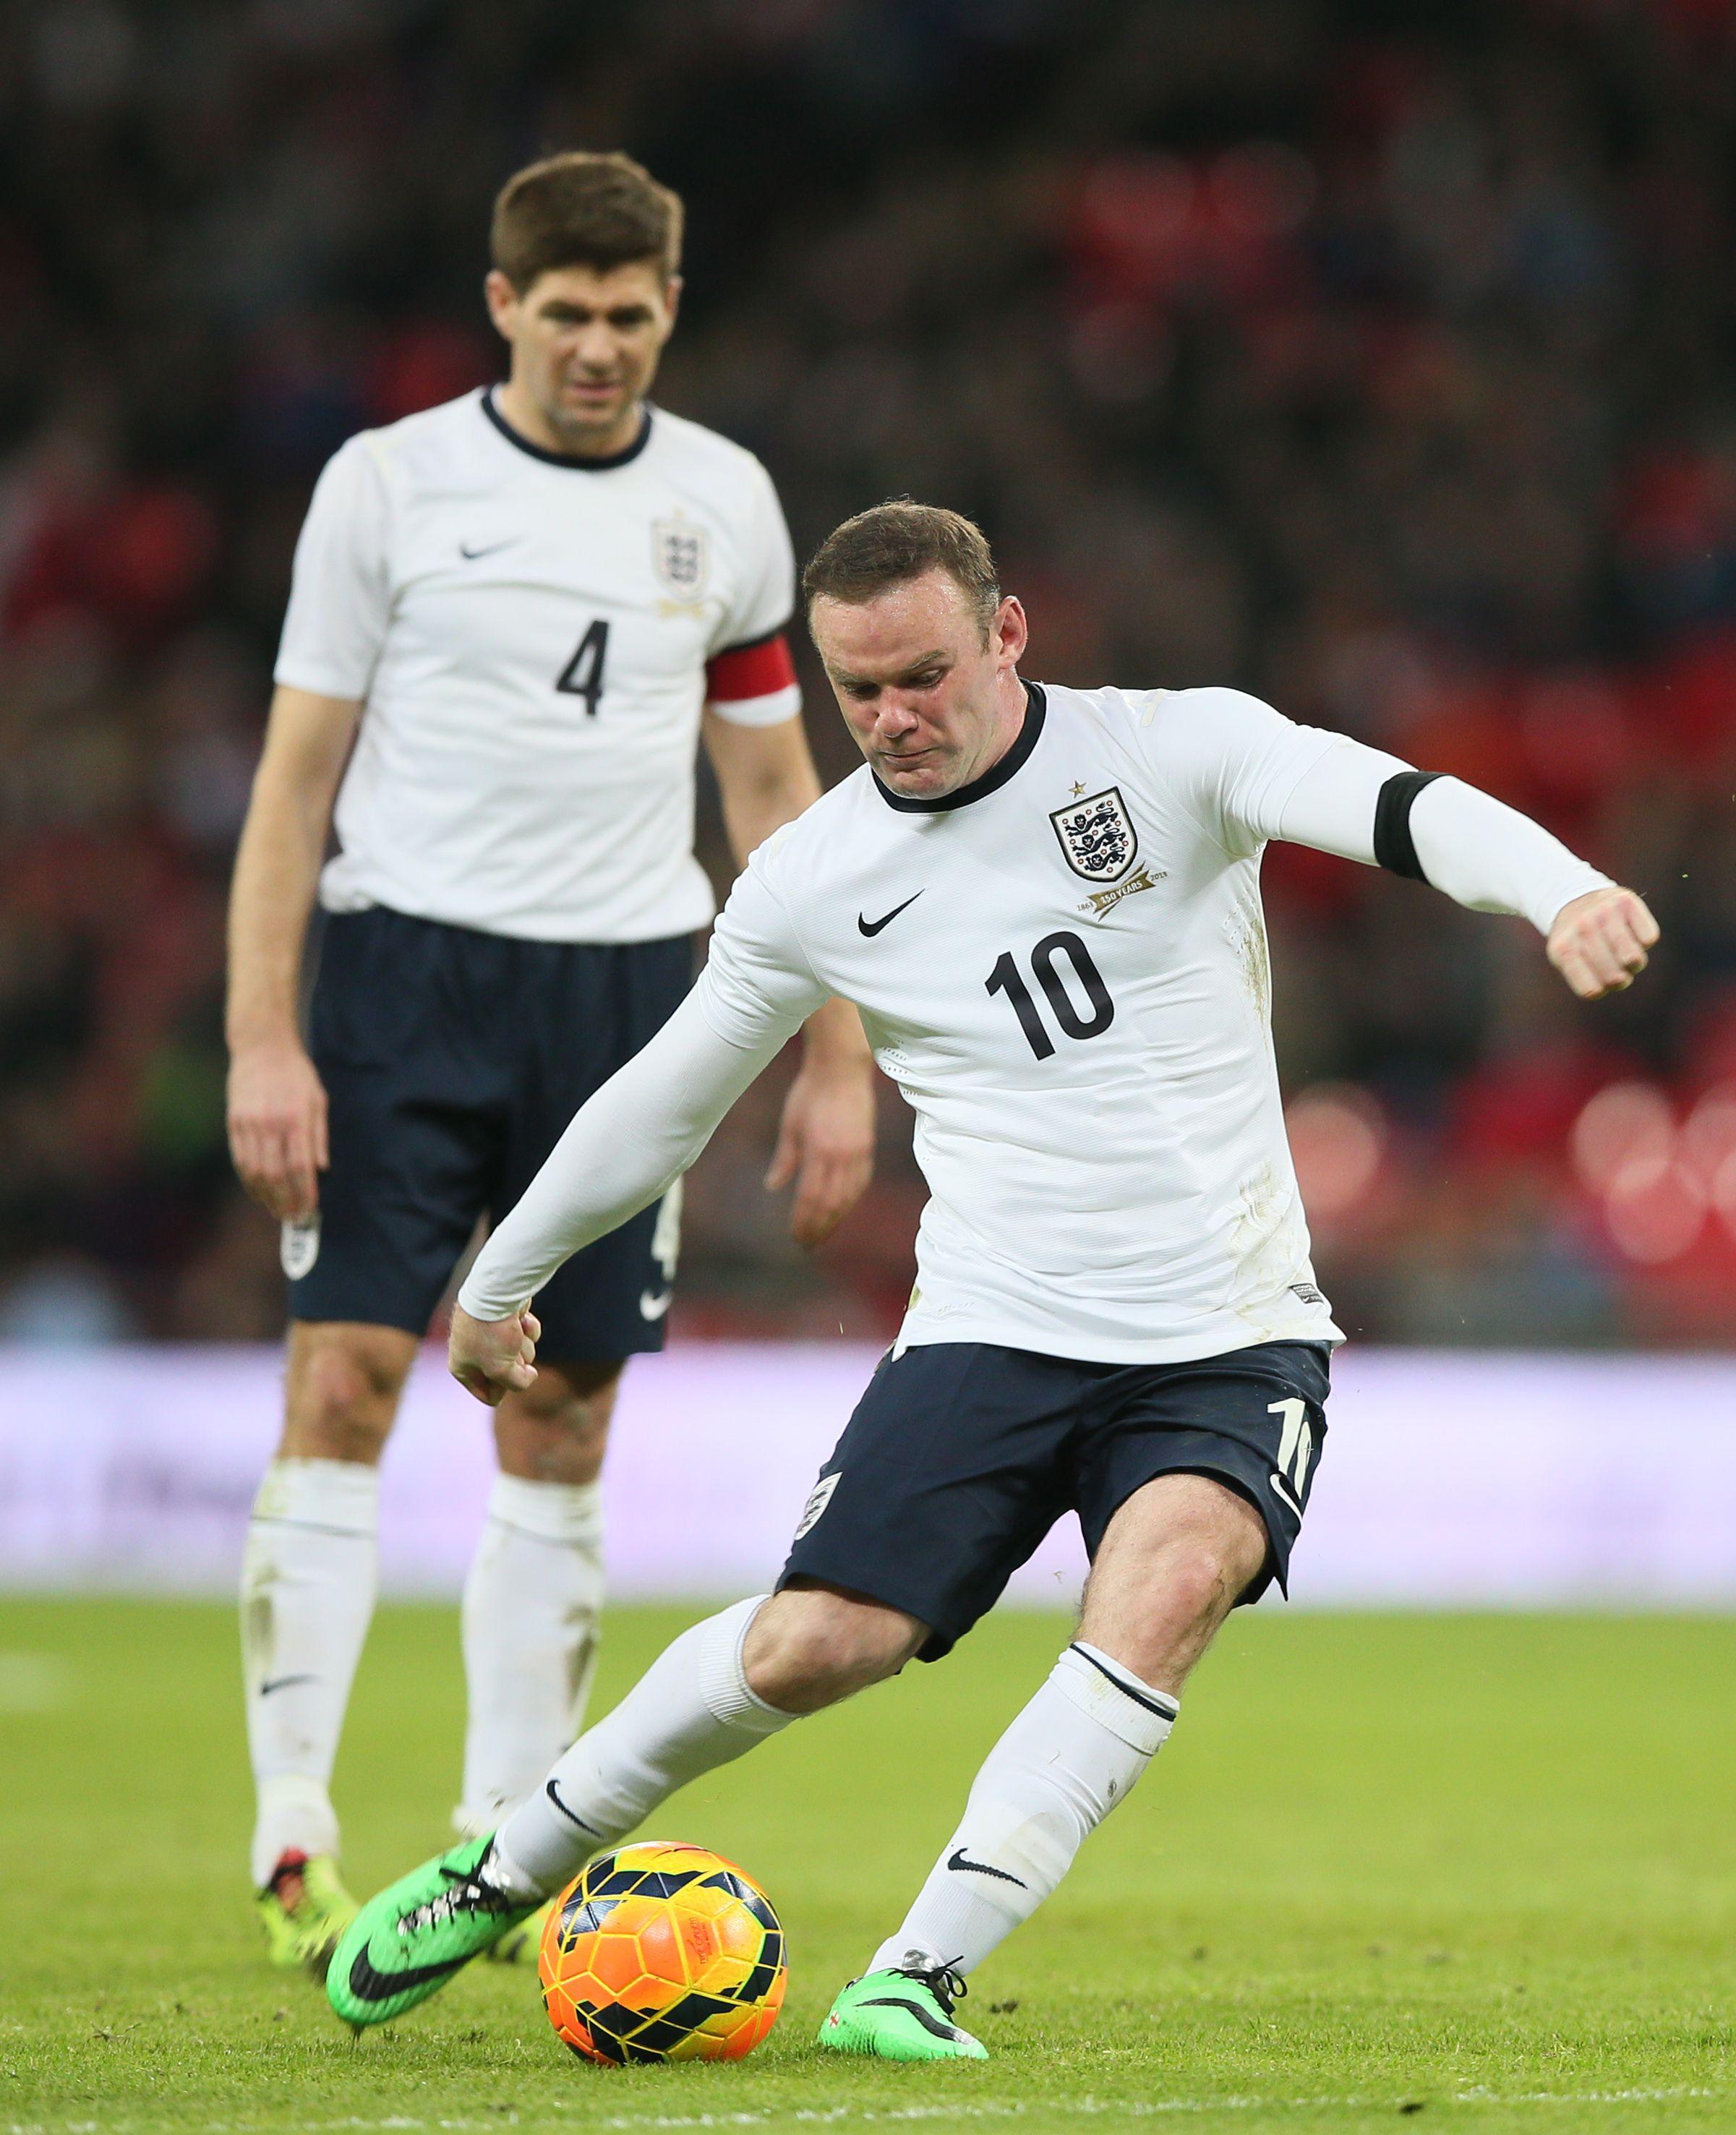 9. Wayne Rooney – Nike, $1.67 million per year